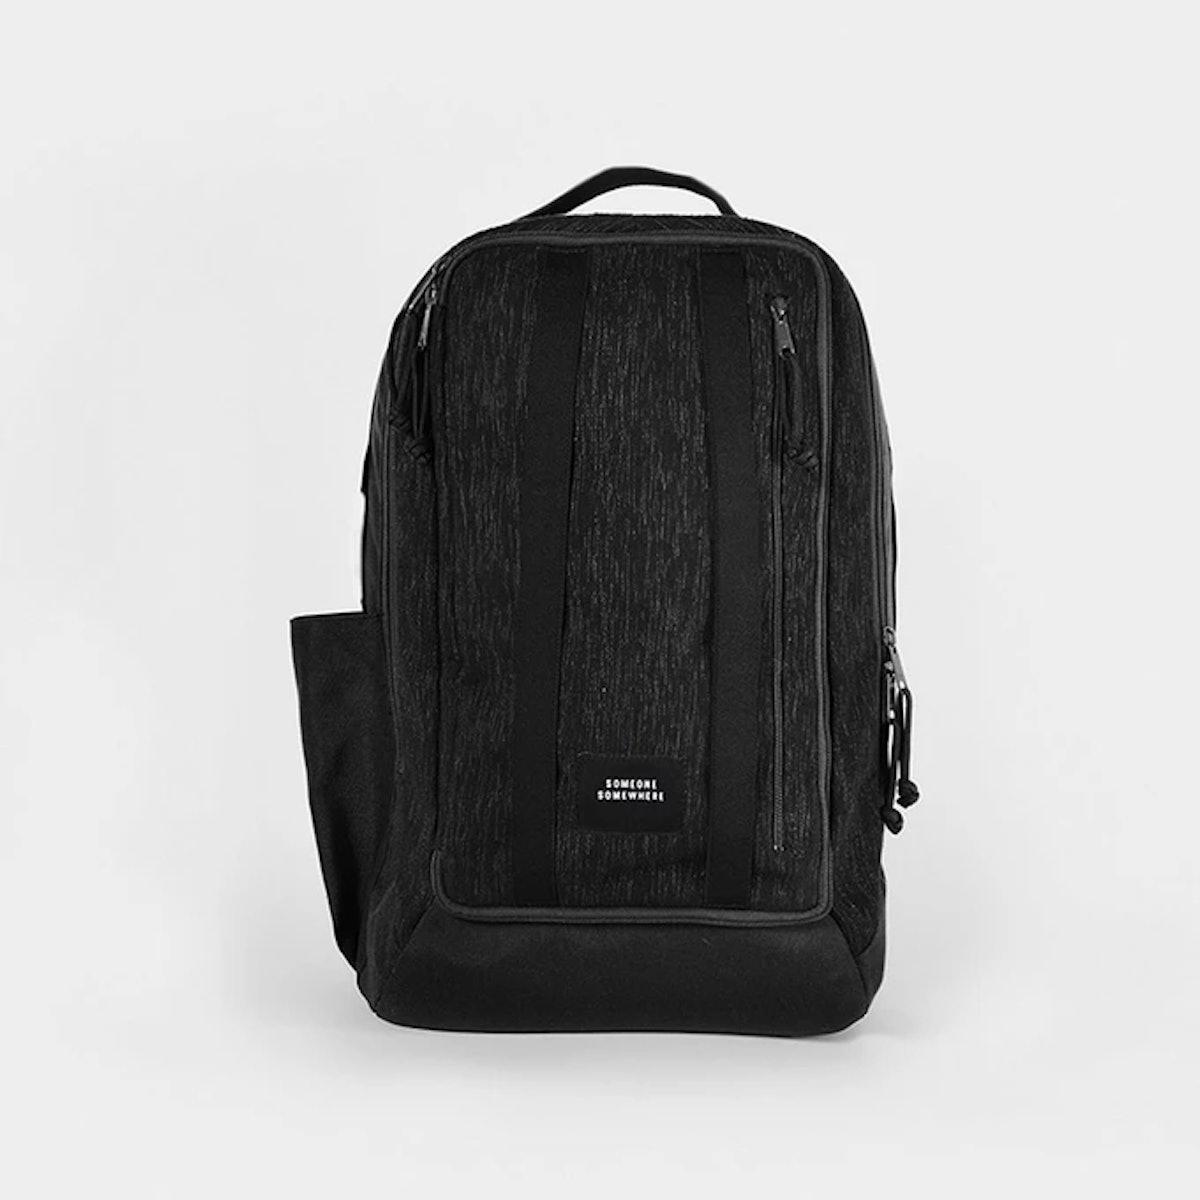 The Everywhere Bag